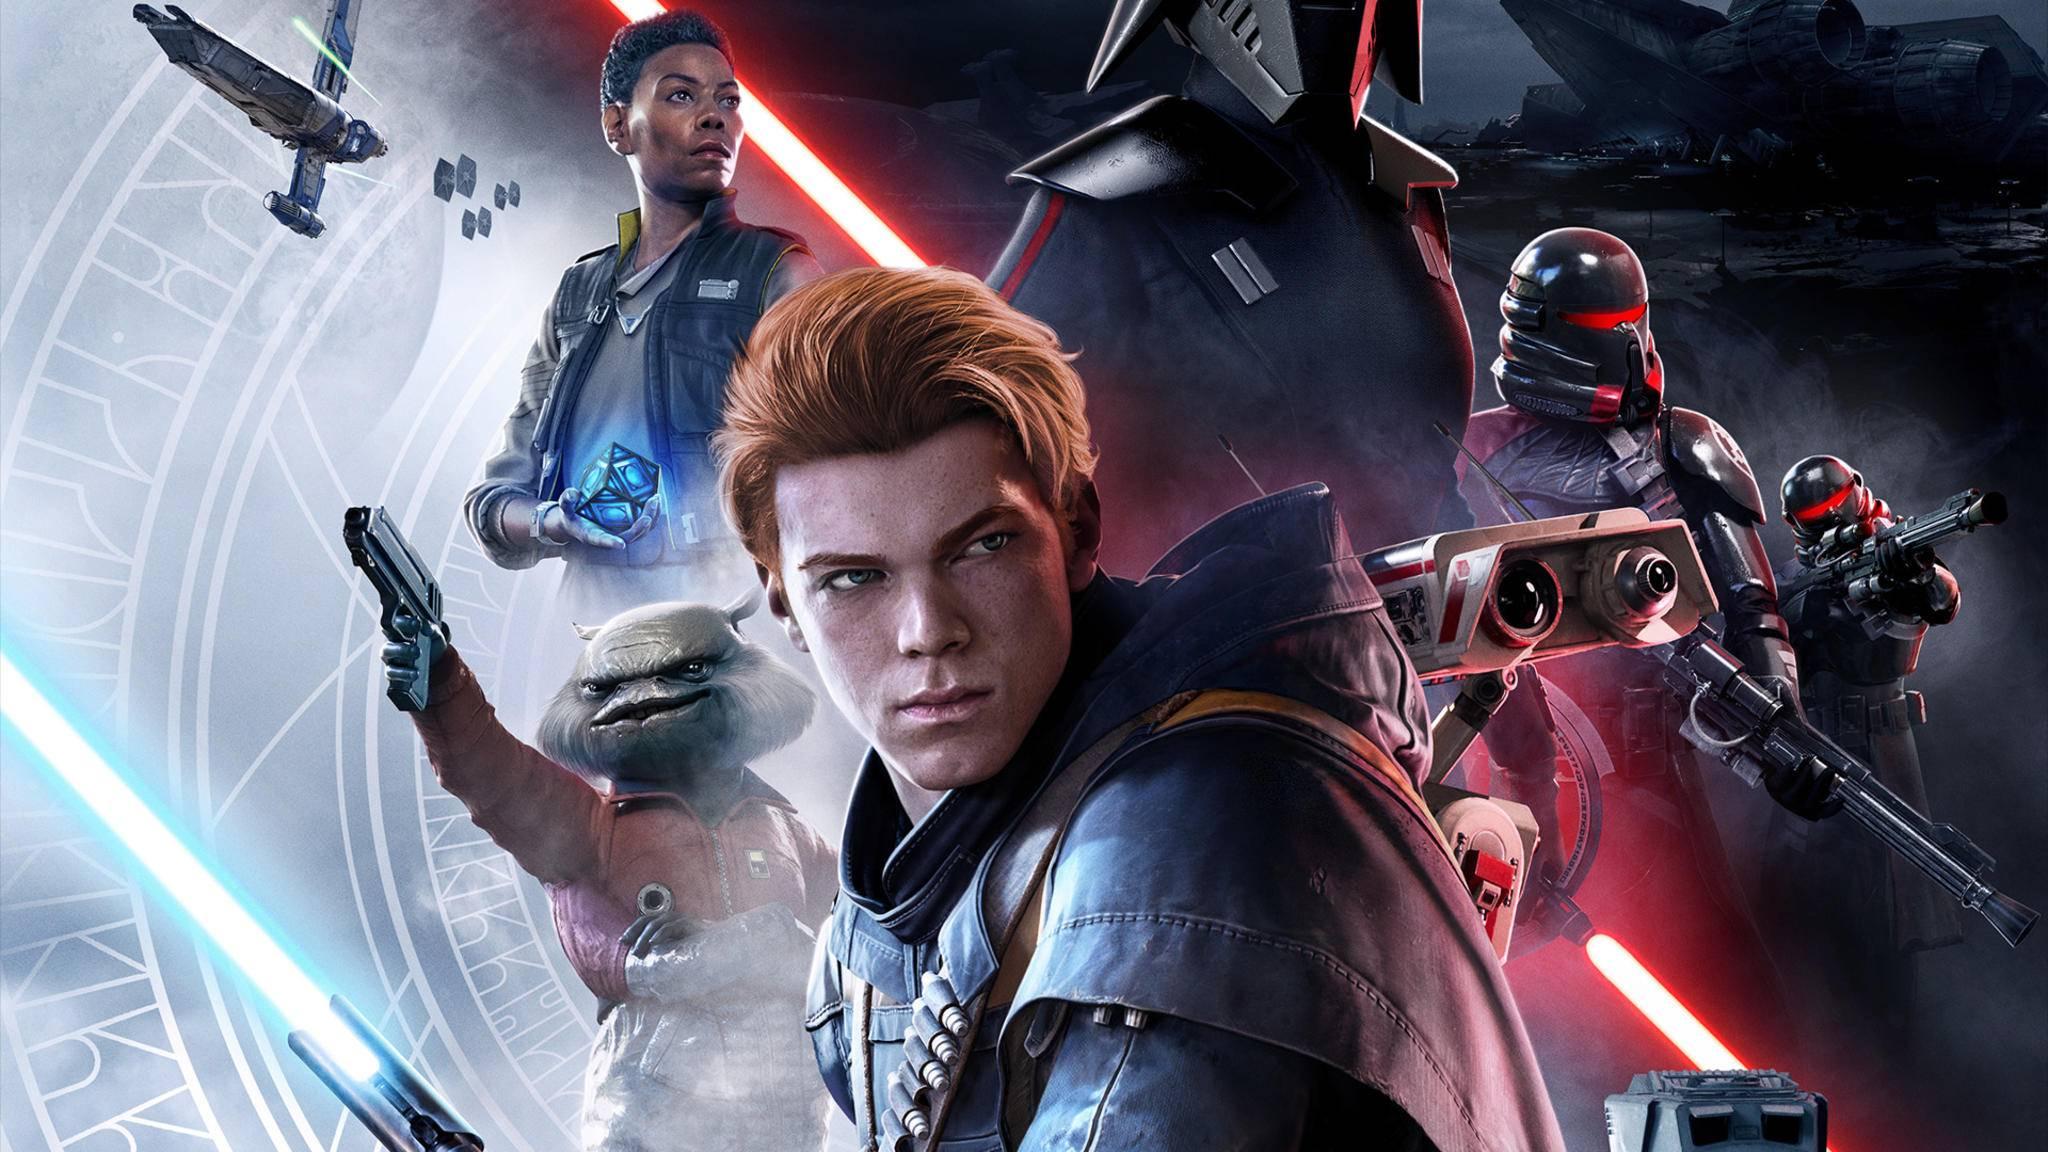 star-wars-jedi-fallen-order-cover-artwork